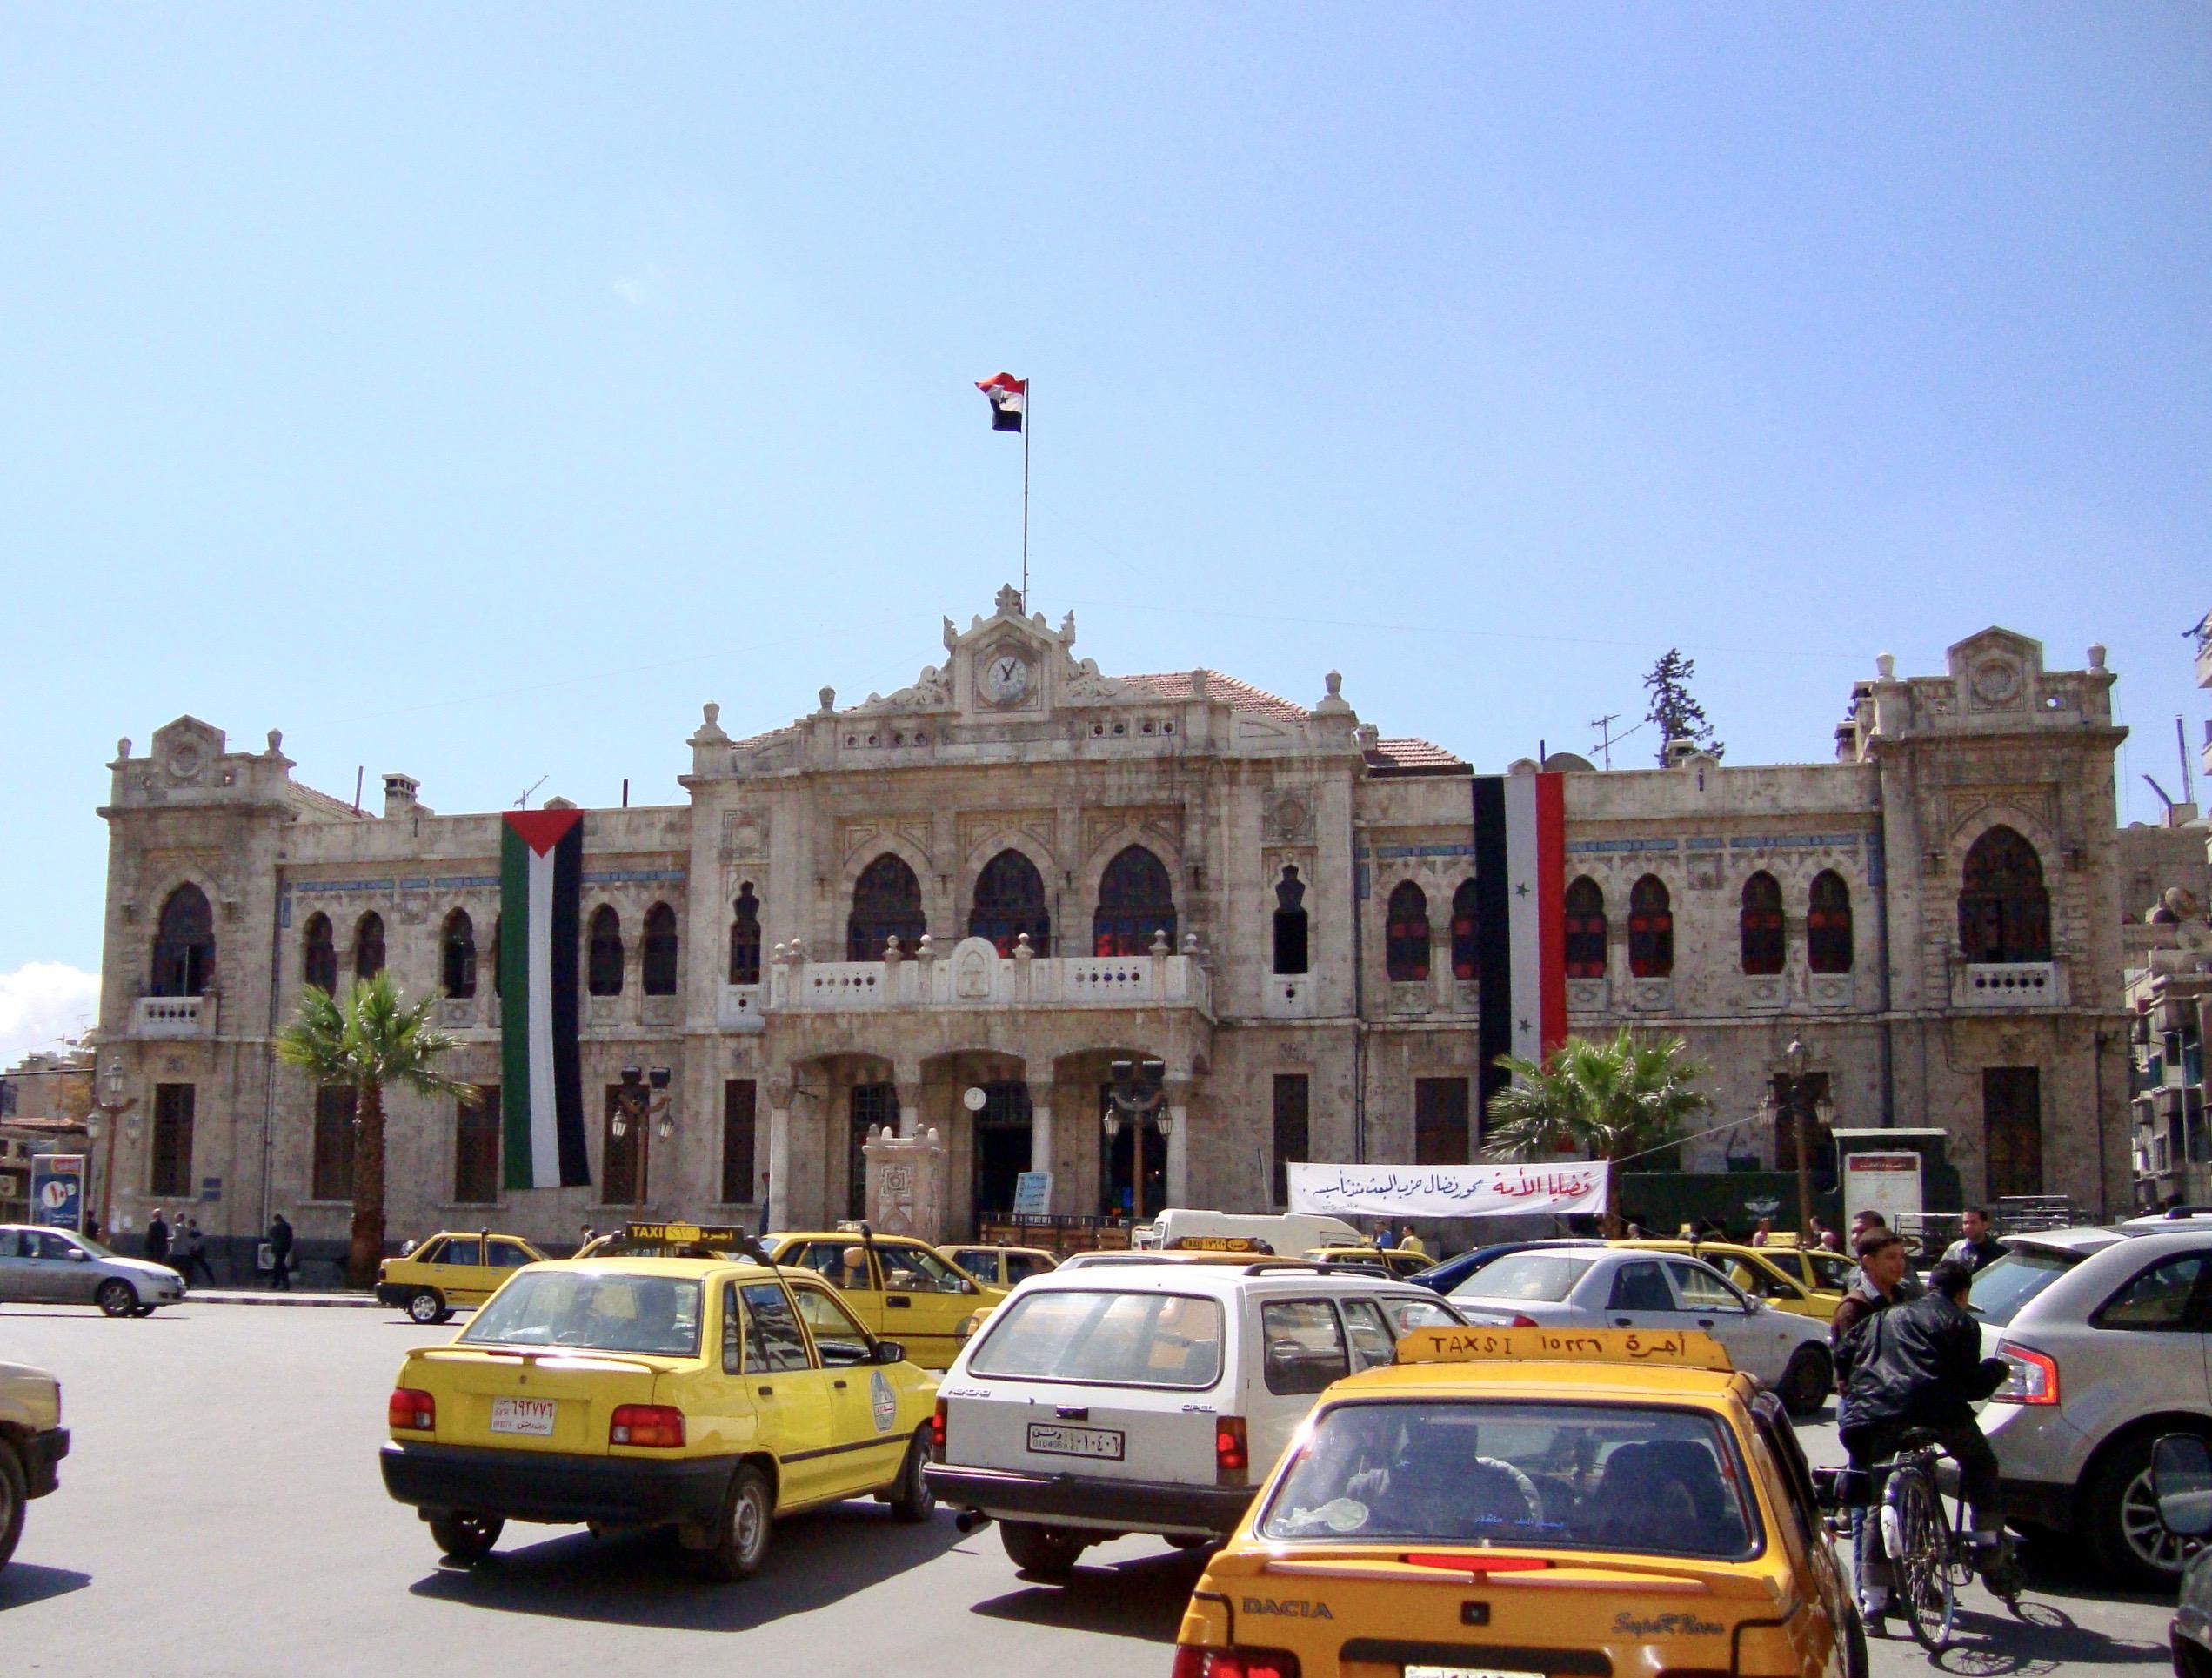 Hejaz Railway Station, Damascus